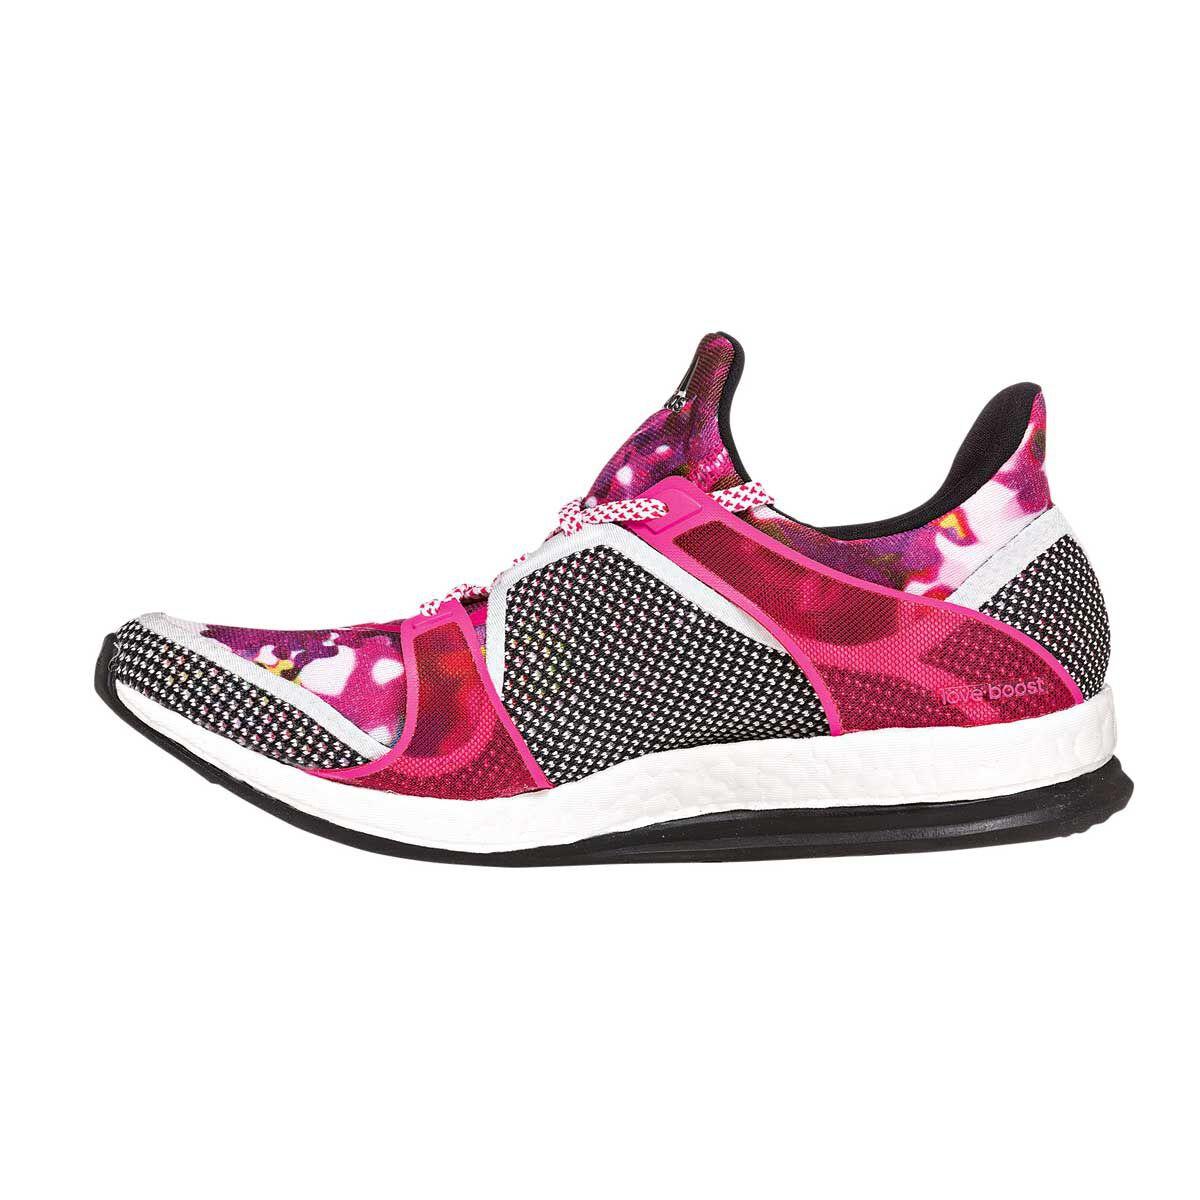 adidas Pure Boost X TR W Black Pink Floral Womens Training Trainers AQ5330